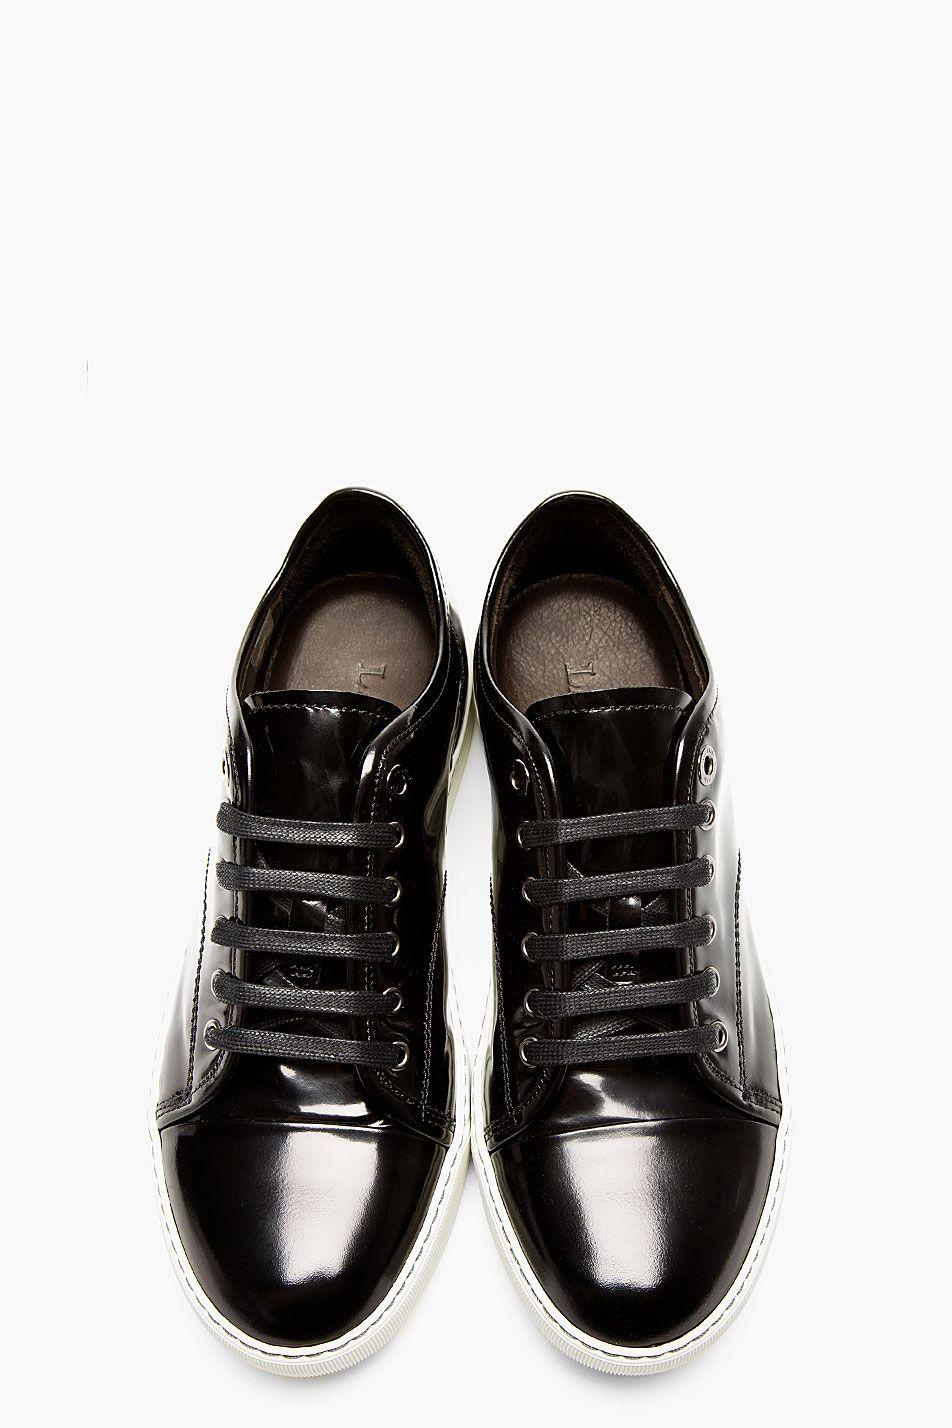 Lanvin - Black Patent Leather Low Top